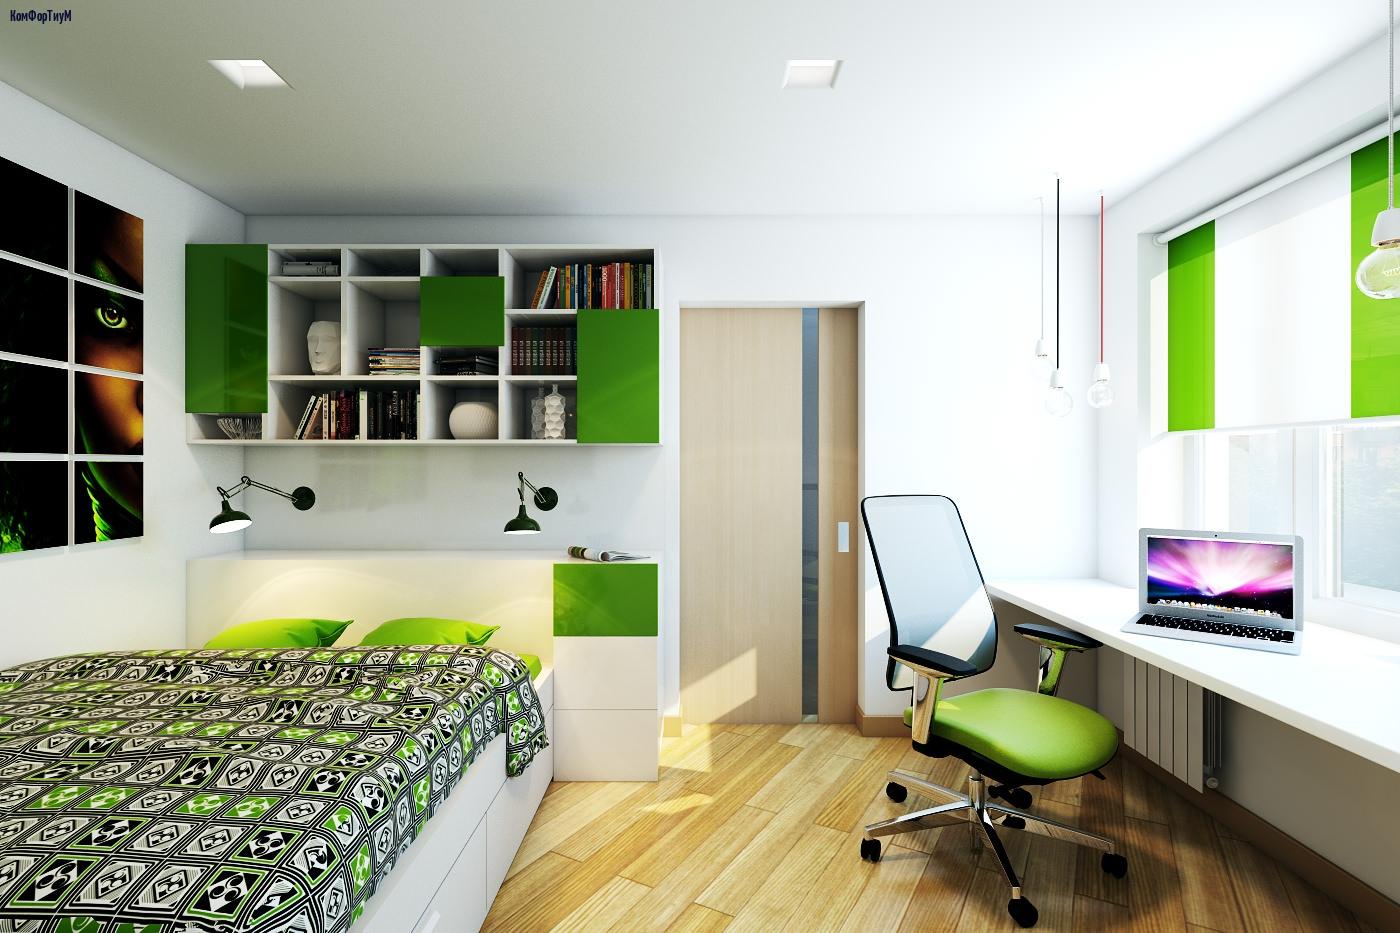 Интерьер 2-Х Комнатной Квартиры 46 Кв. М. within 83 Потрясающие Дизайн Трехкомнатной Квартиры В Панельном Доме